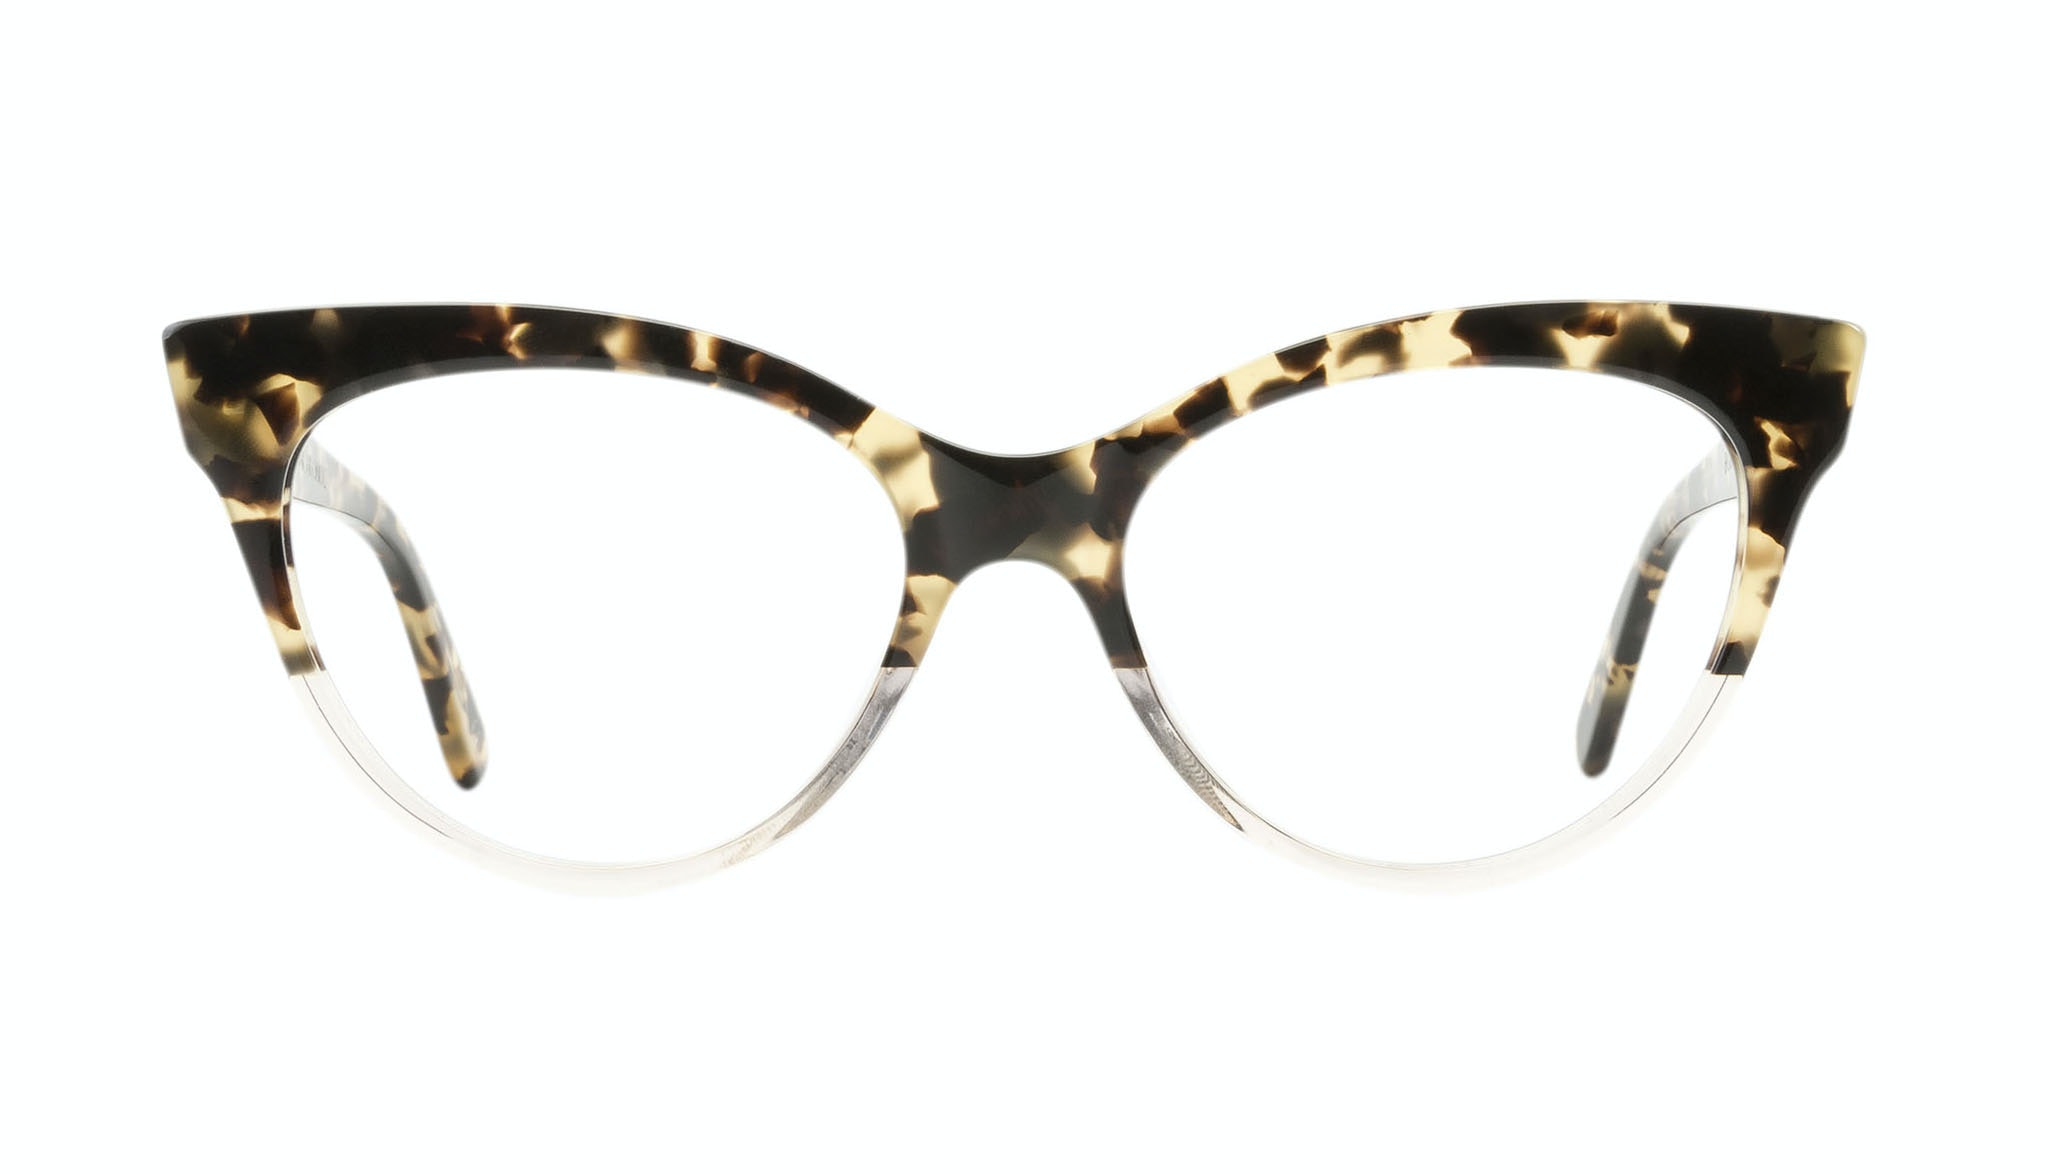 Affordable Fashion Glasses Cat Eye Eyeglasses Women SkunkBoy Champagne Tort